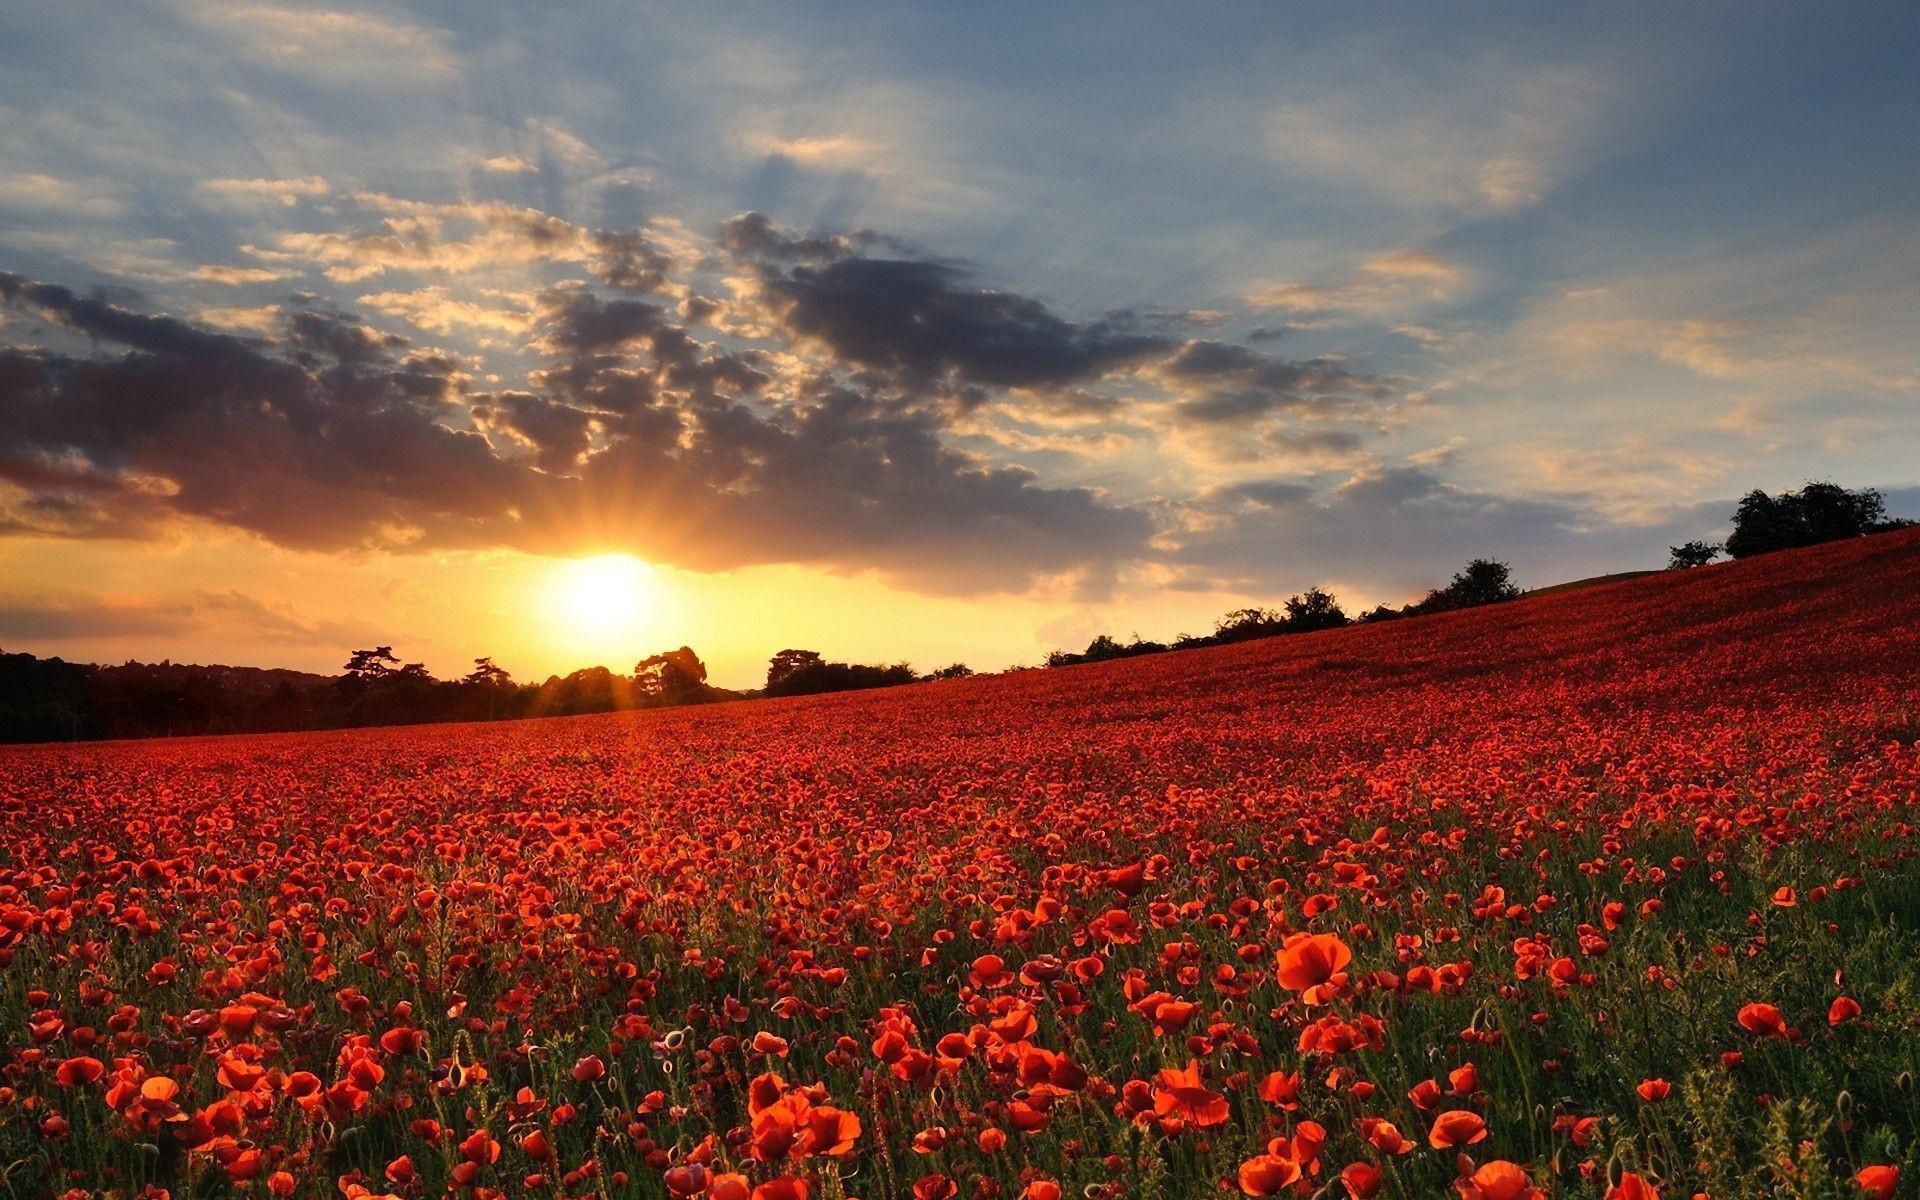 Poppy Flower Field Sunset Wallpaper 7711 – uMad.com